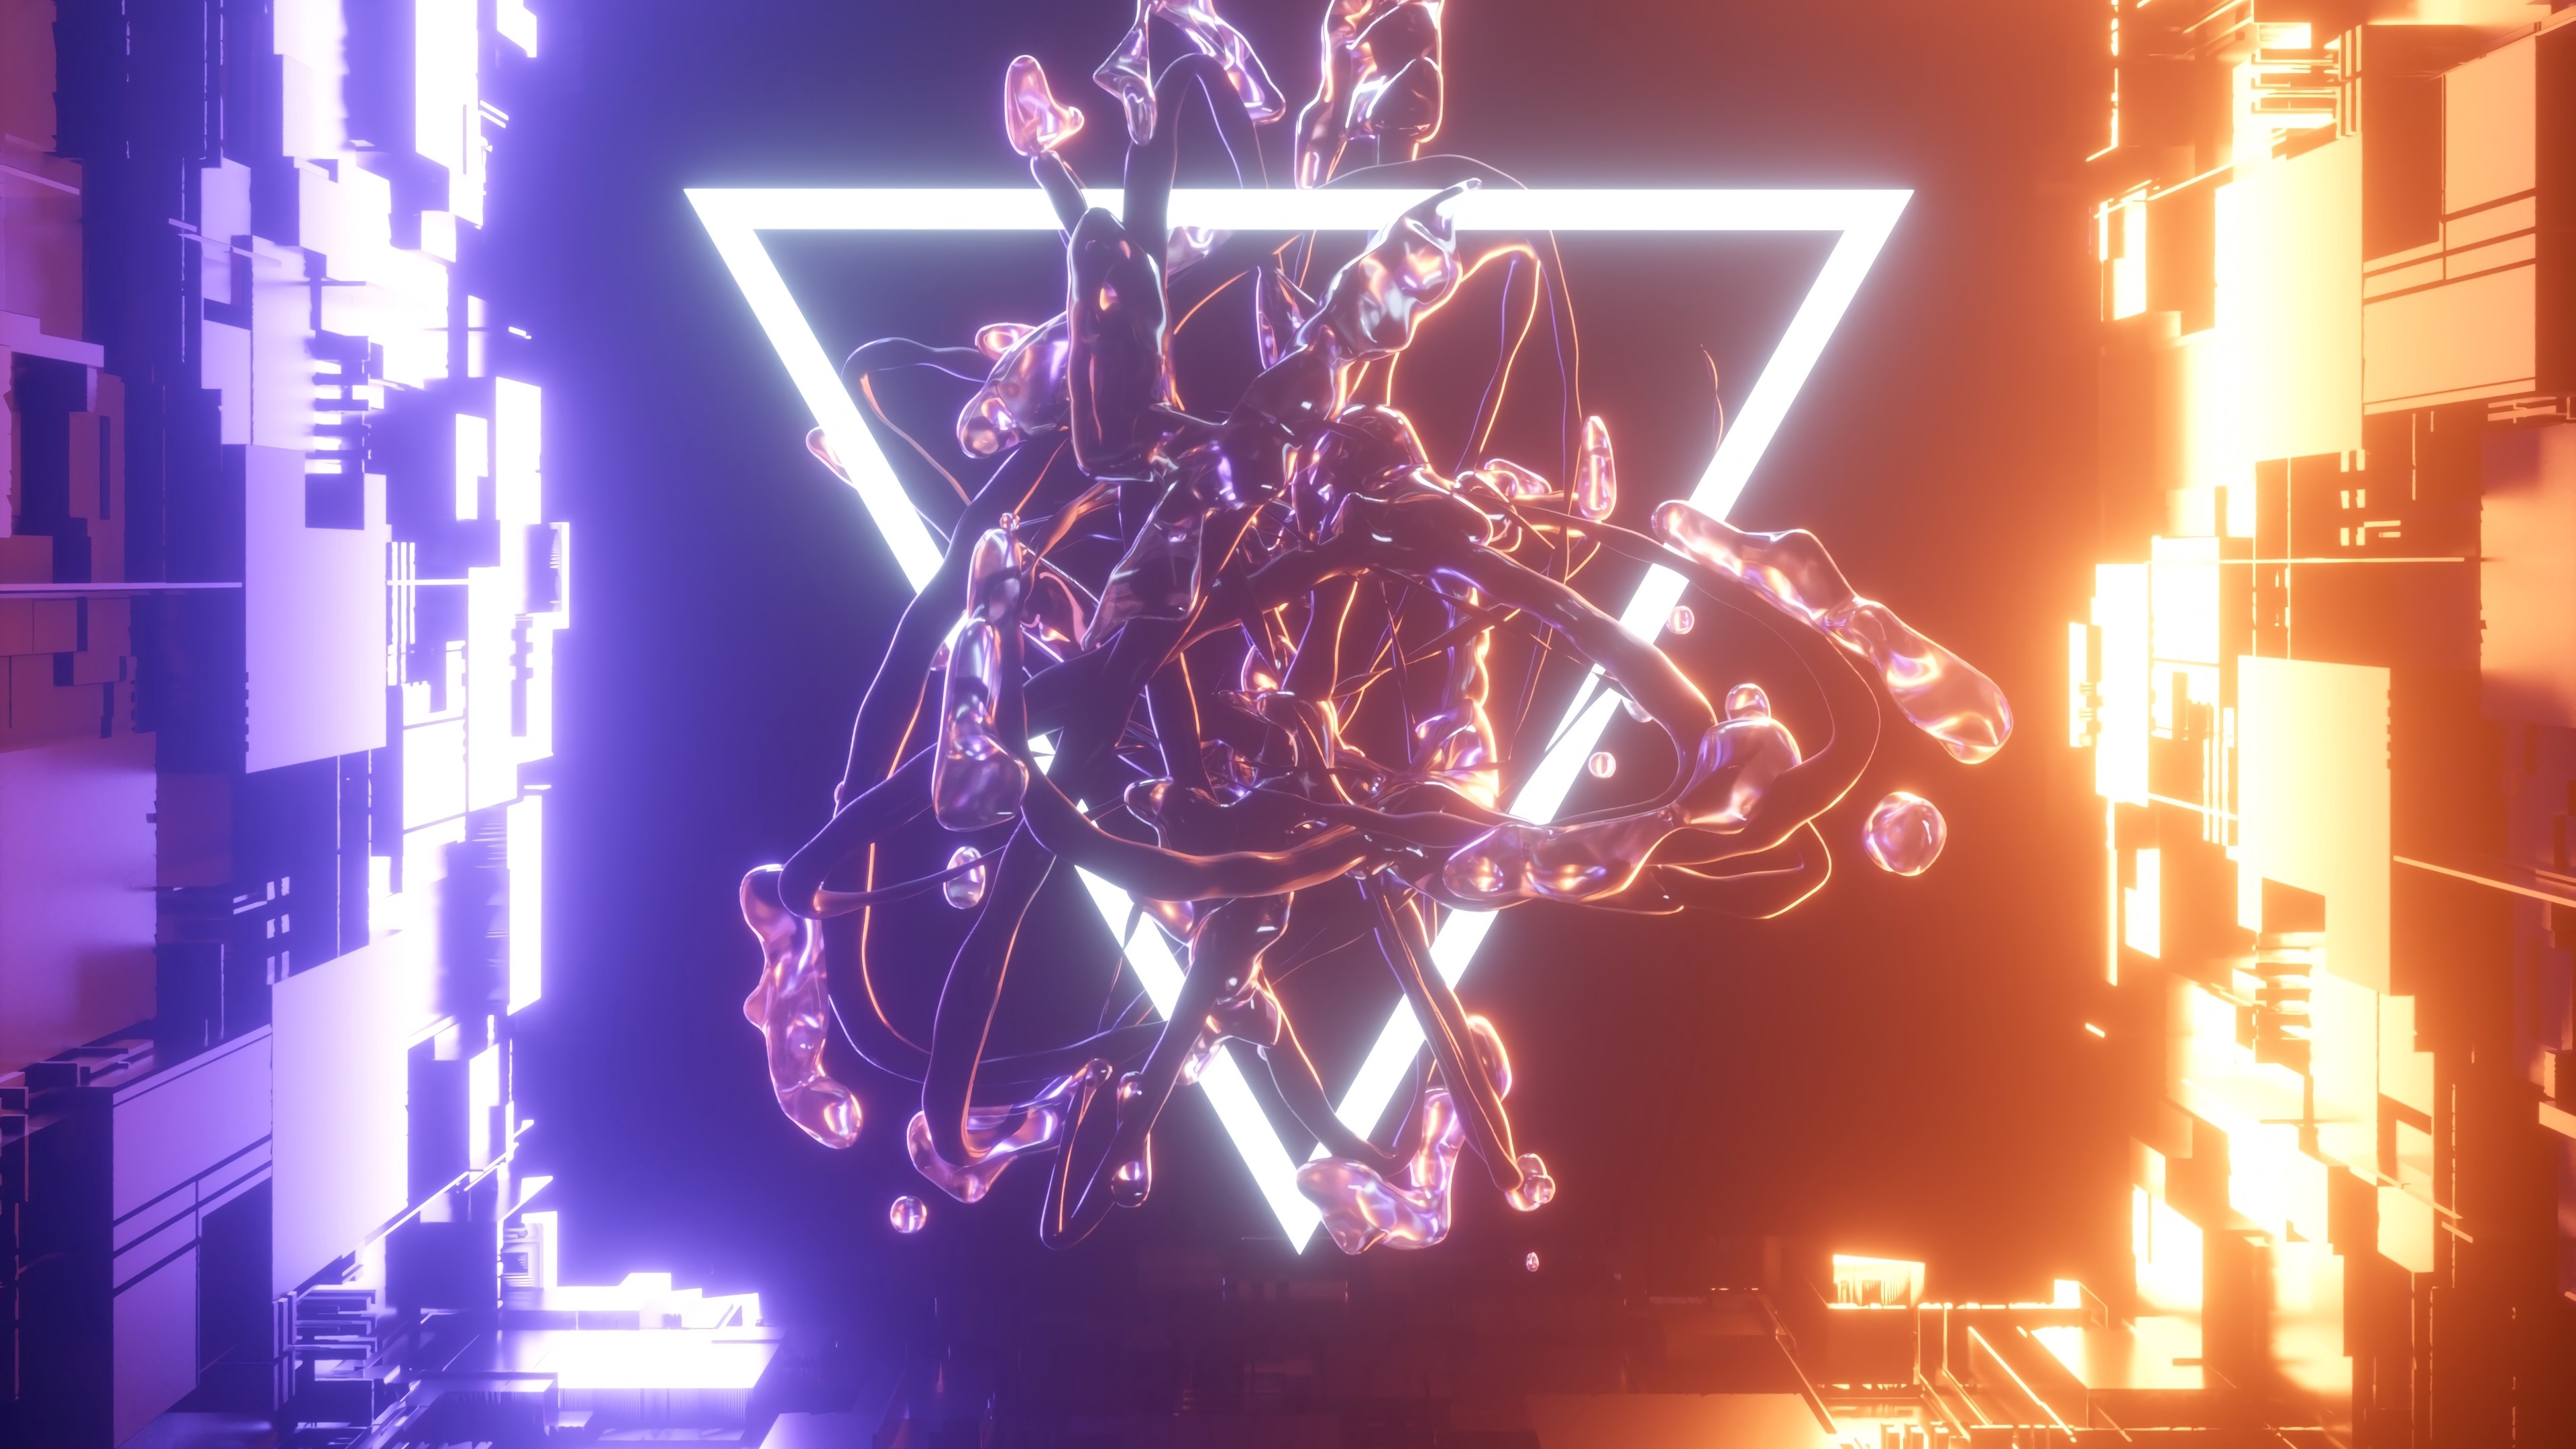 3d Abstract Neon Light Triangle Wallpaper 4k Ultra Hd Id 3466